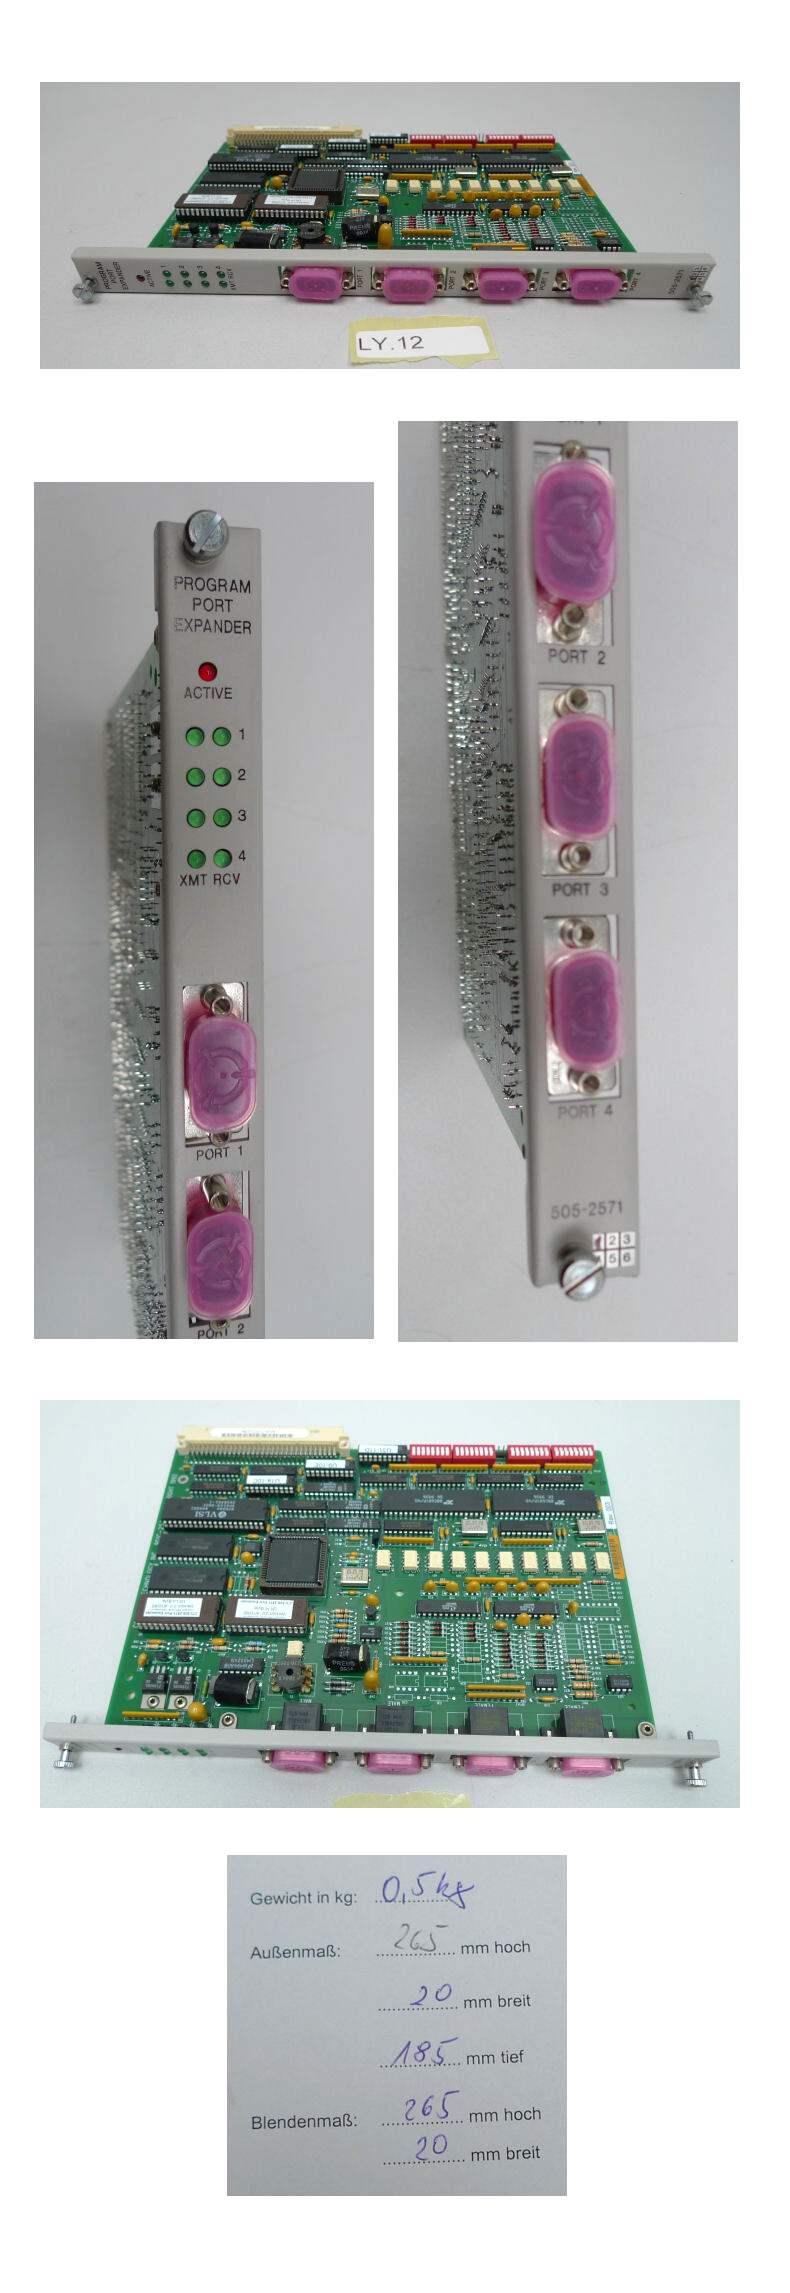 Siemens Texas Instruments 505-2571 5052571 Expander